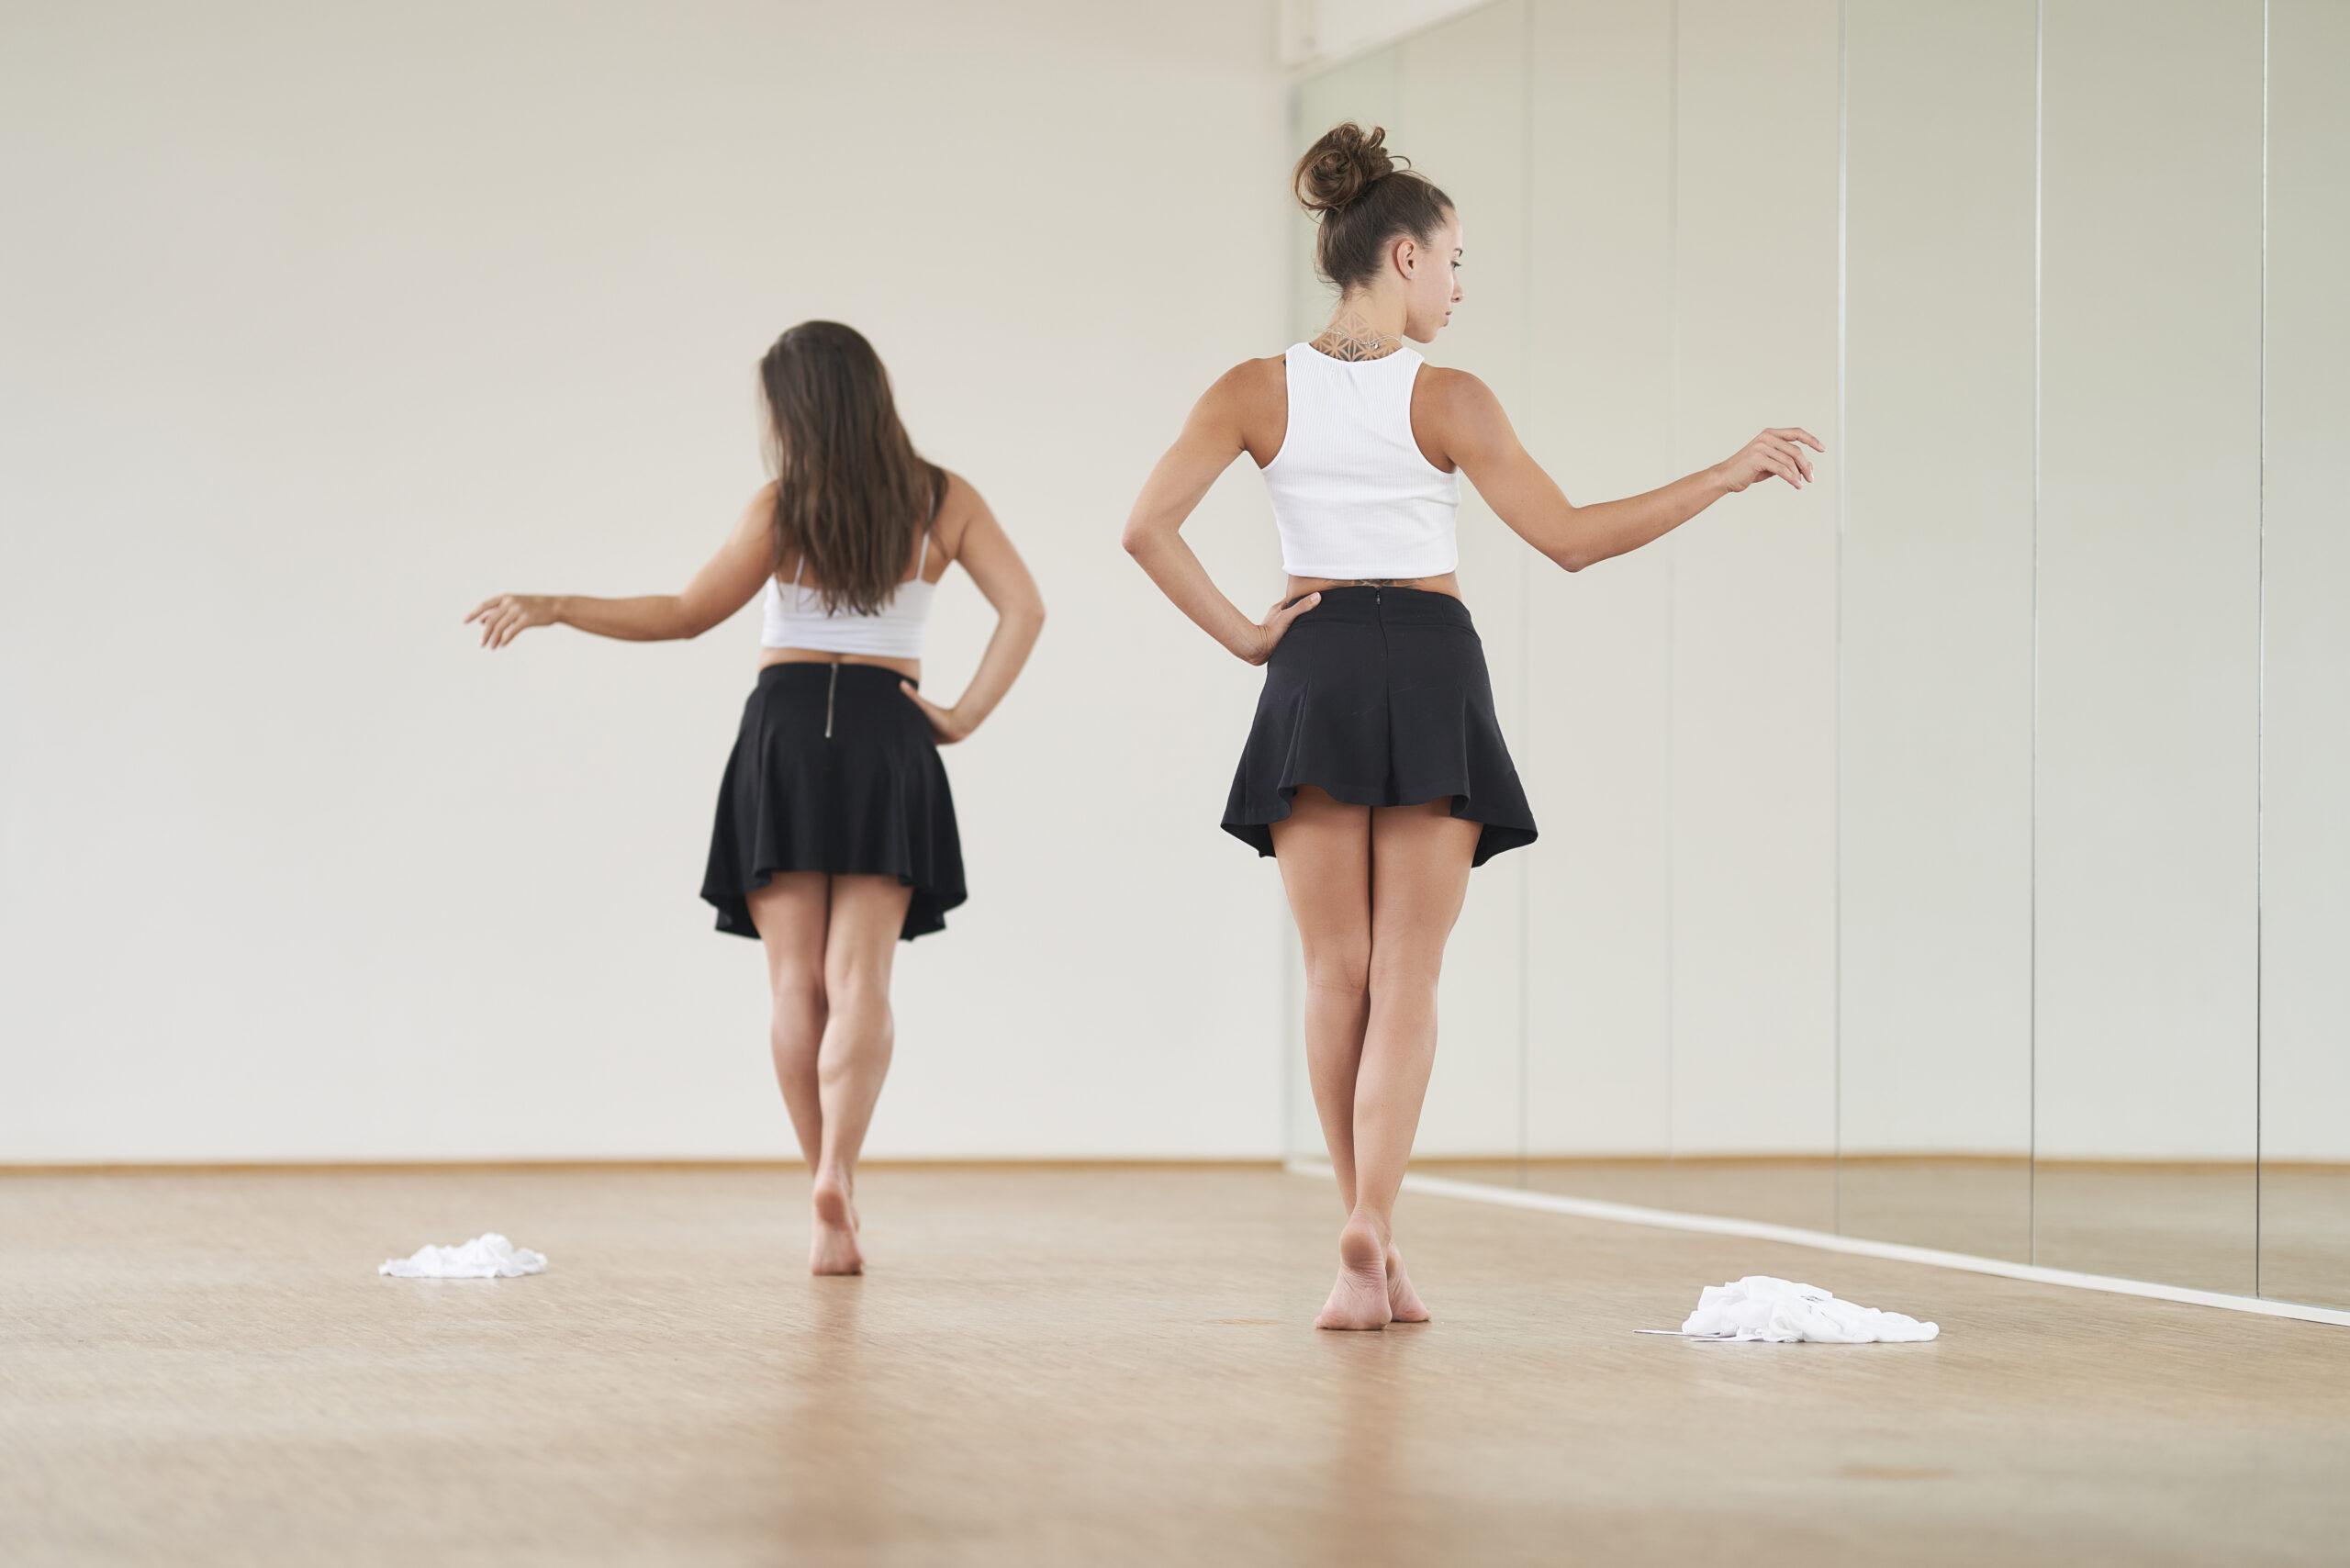 munich-poledance-tease-cover-01